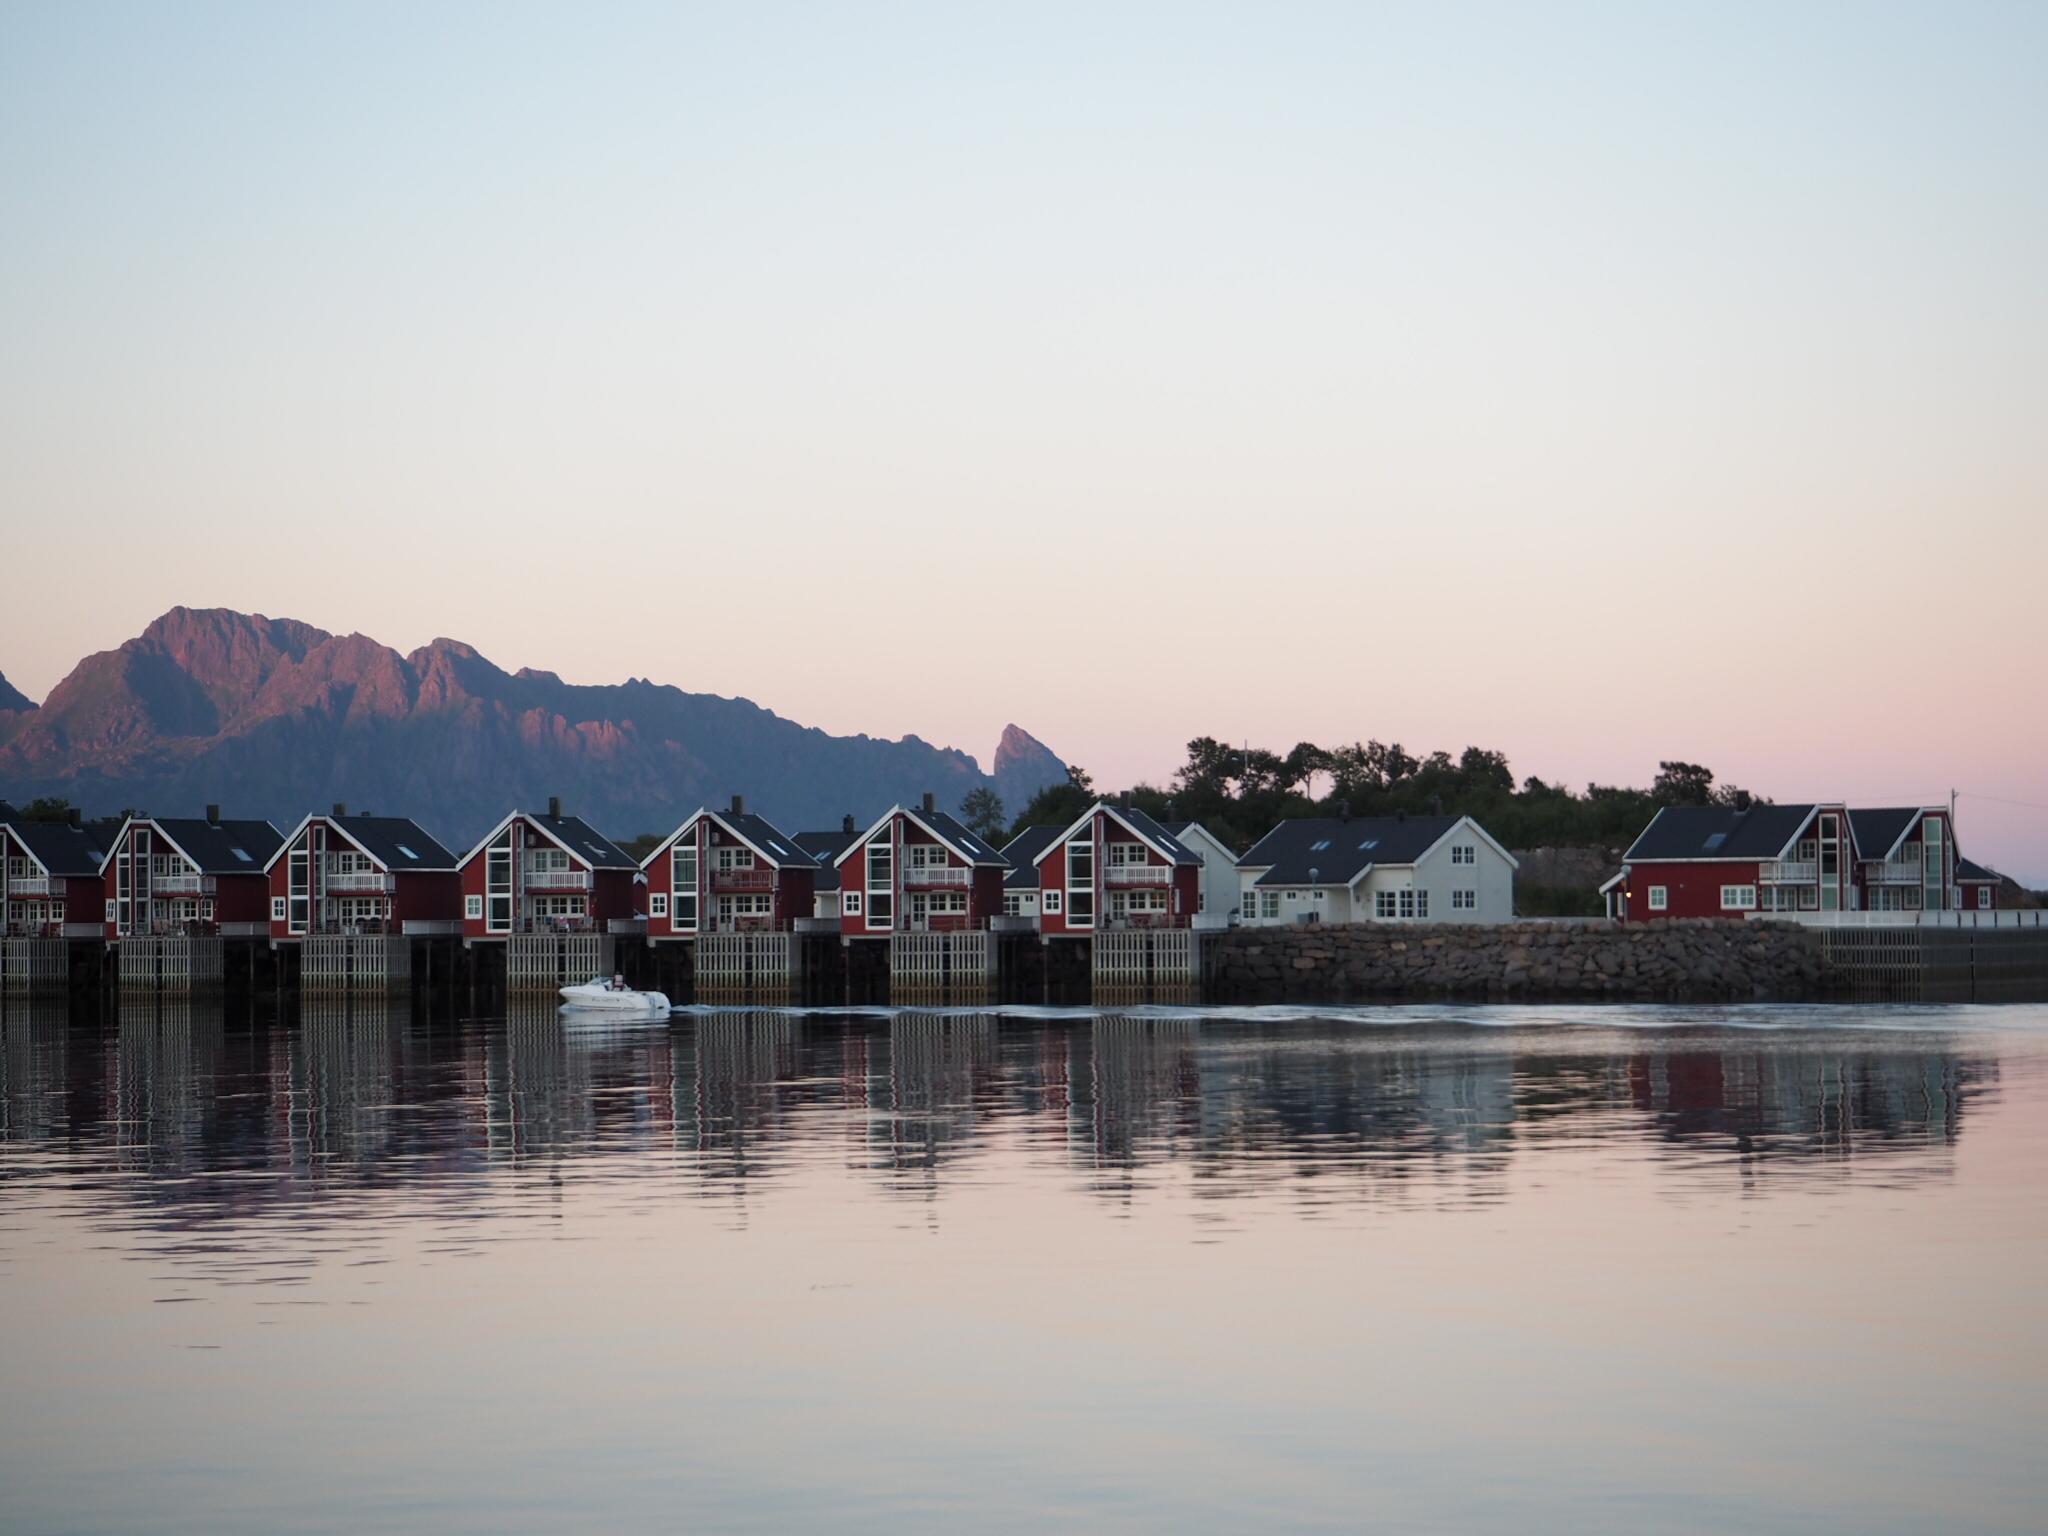 SwimQuest Lofoten Islands